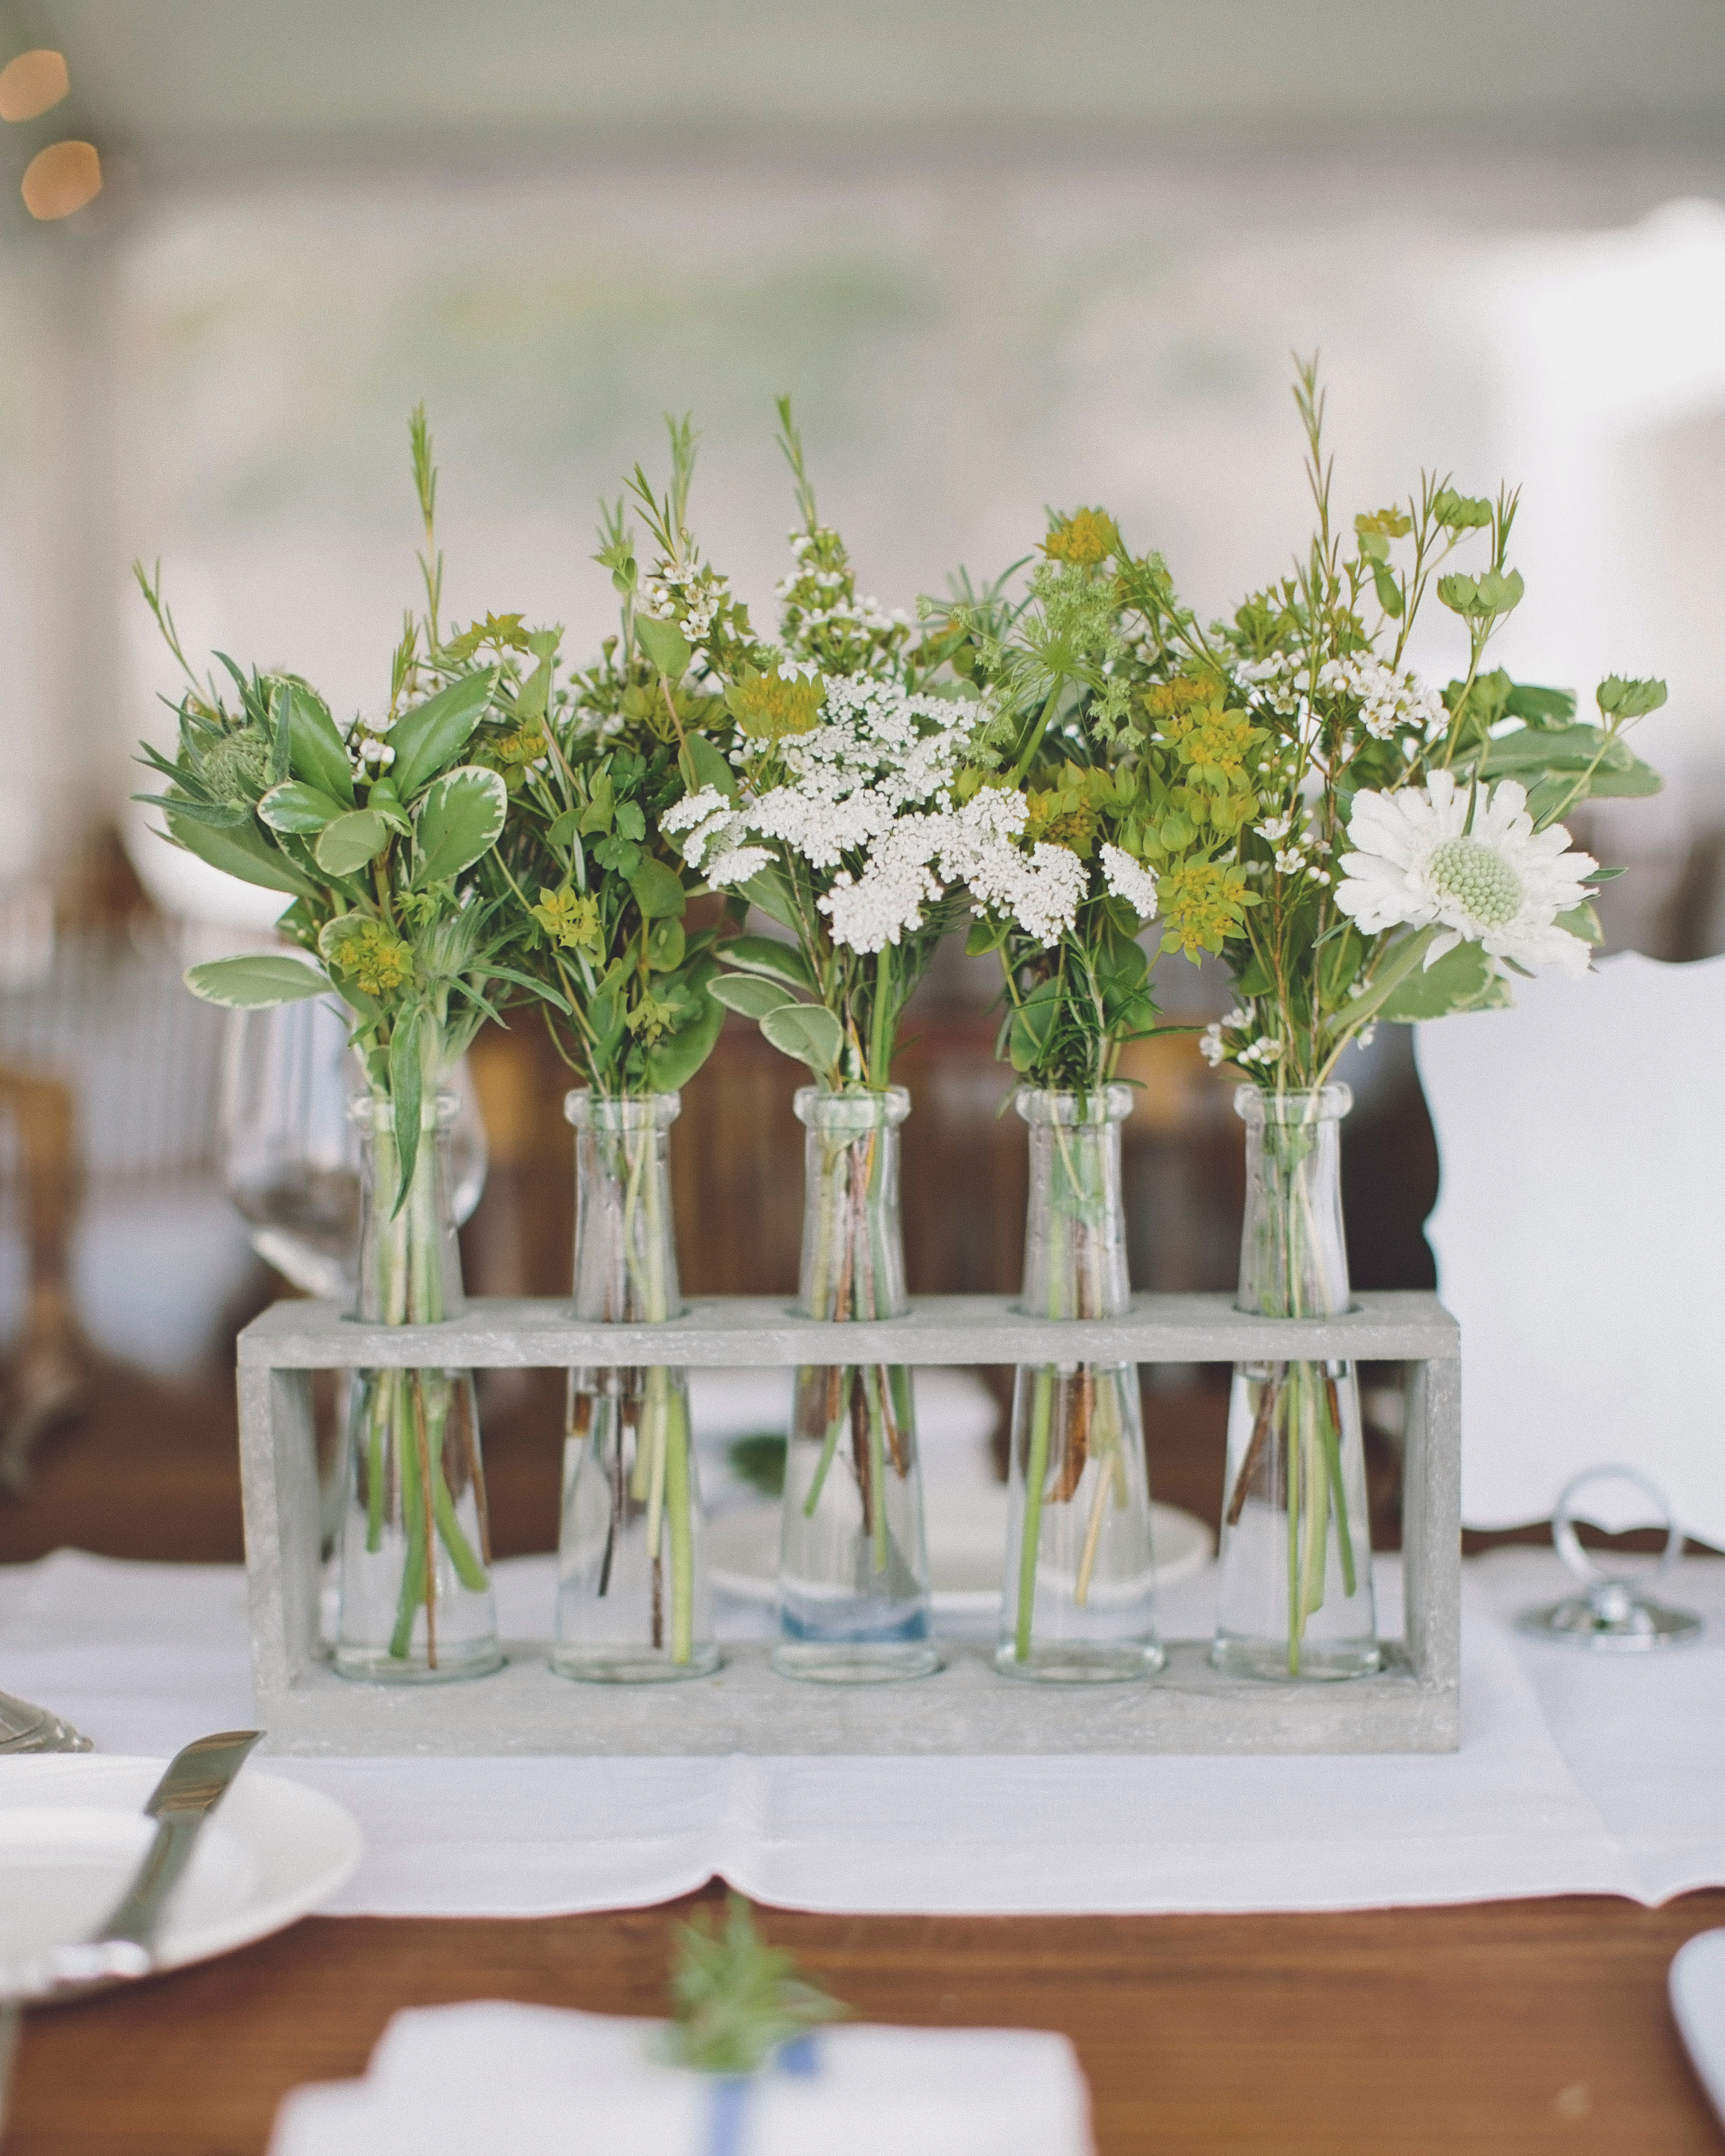 molly-greg-wedding-centerpiece-00033-s111481-0814.jpg